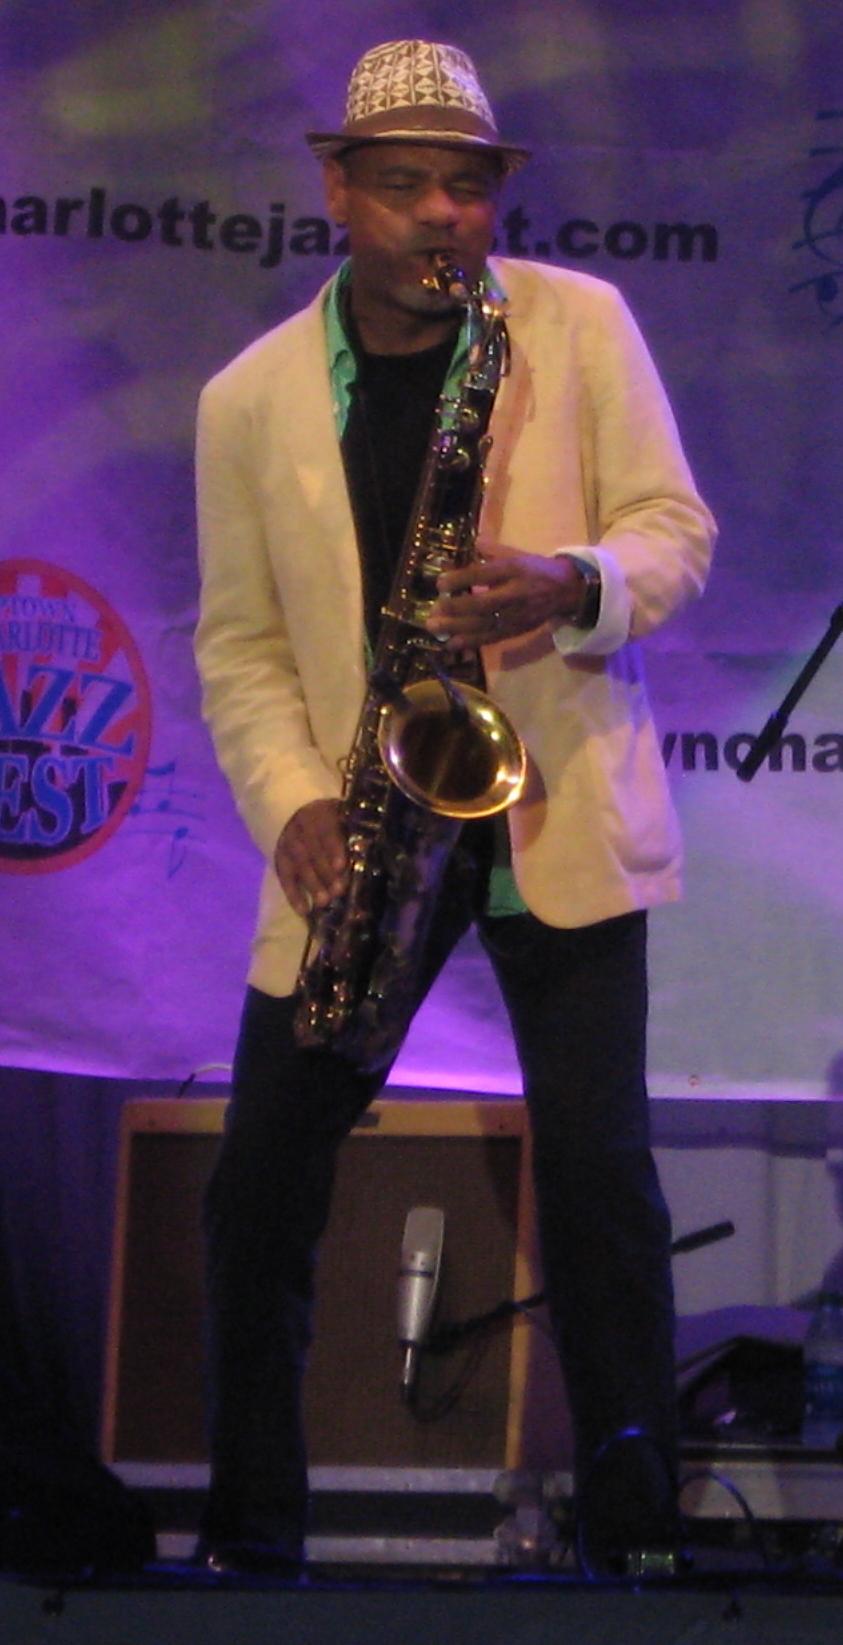 Kirk whalum,uptown jazz fest